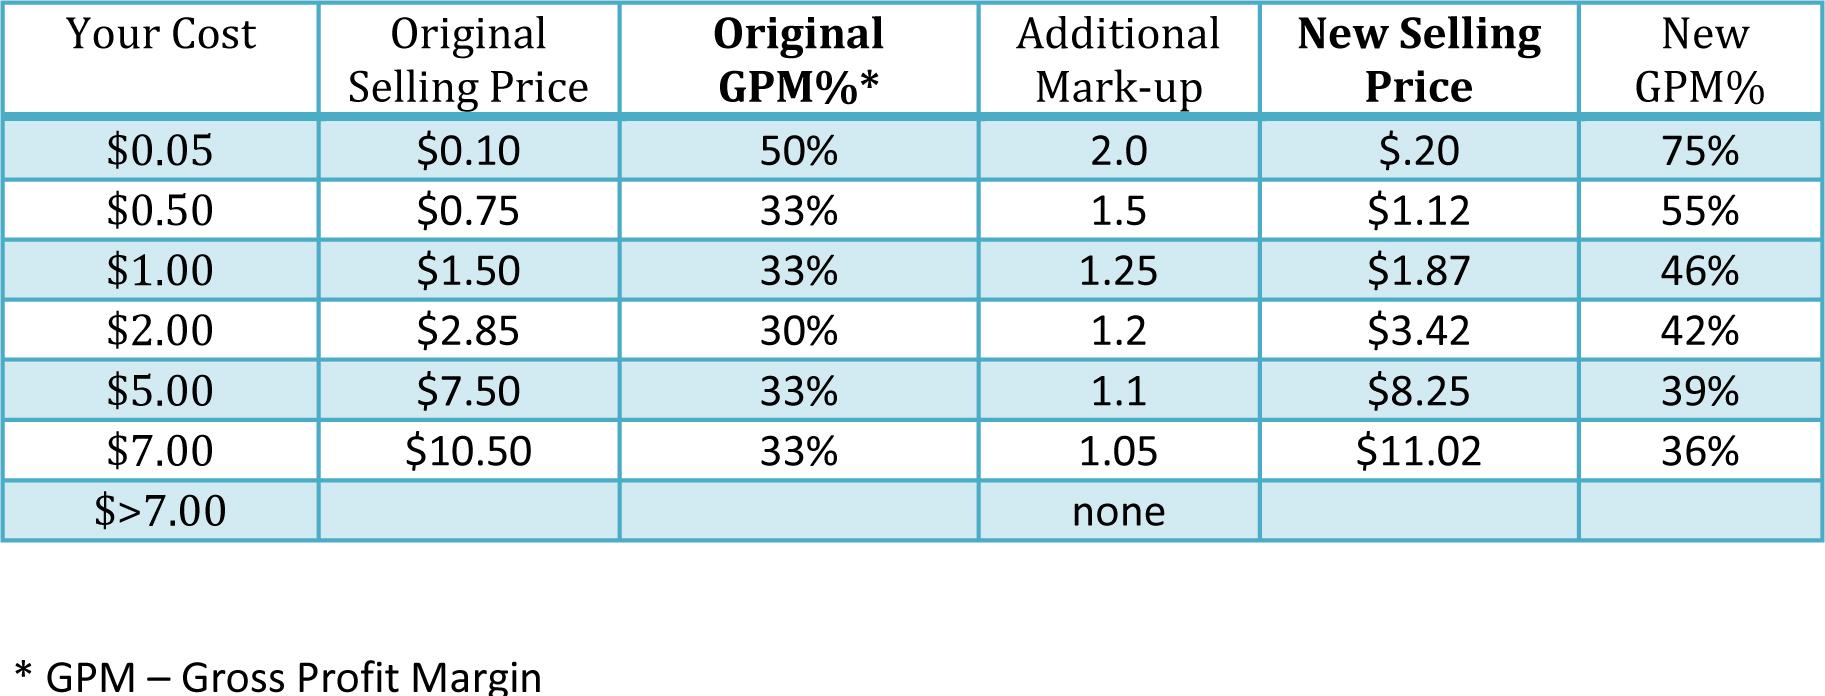 Profit and profitability. Some aspects 85